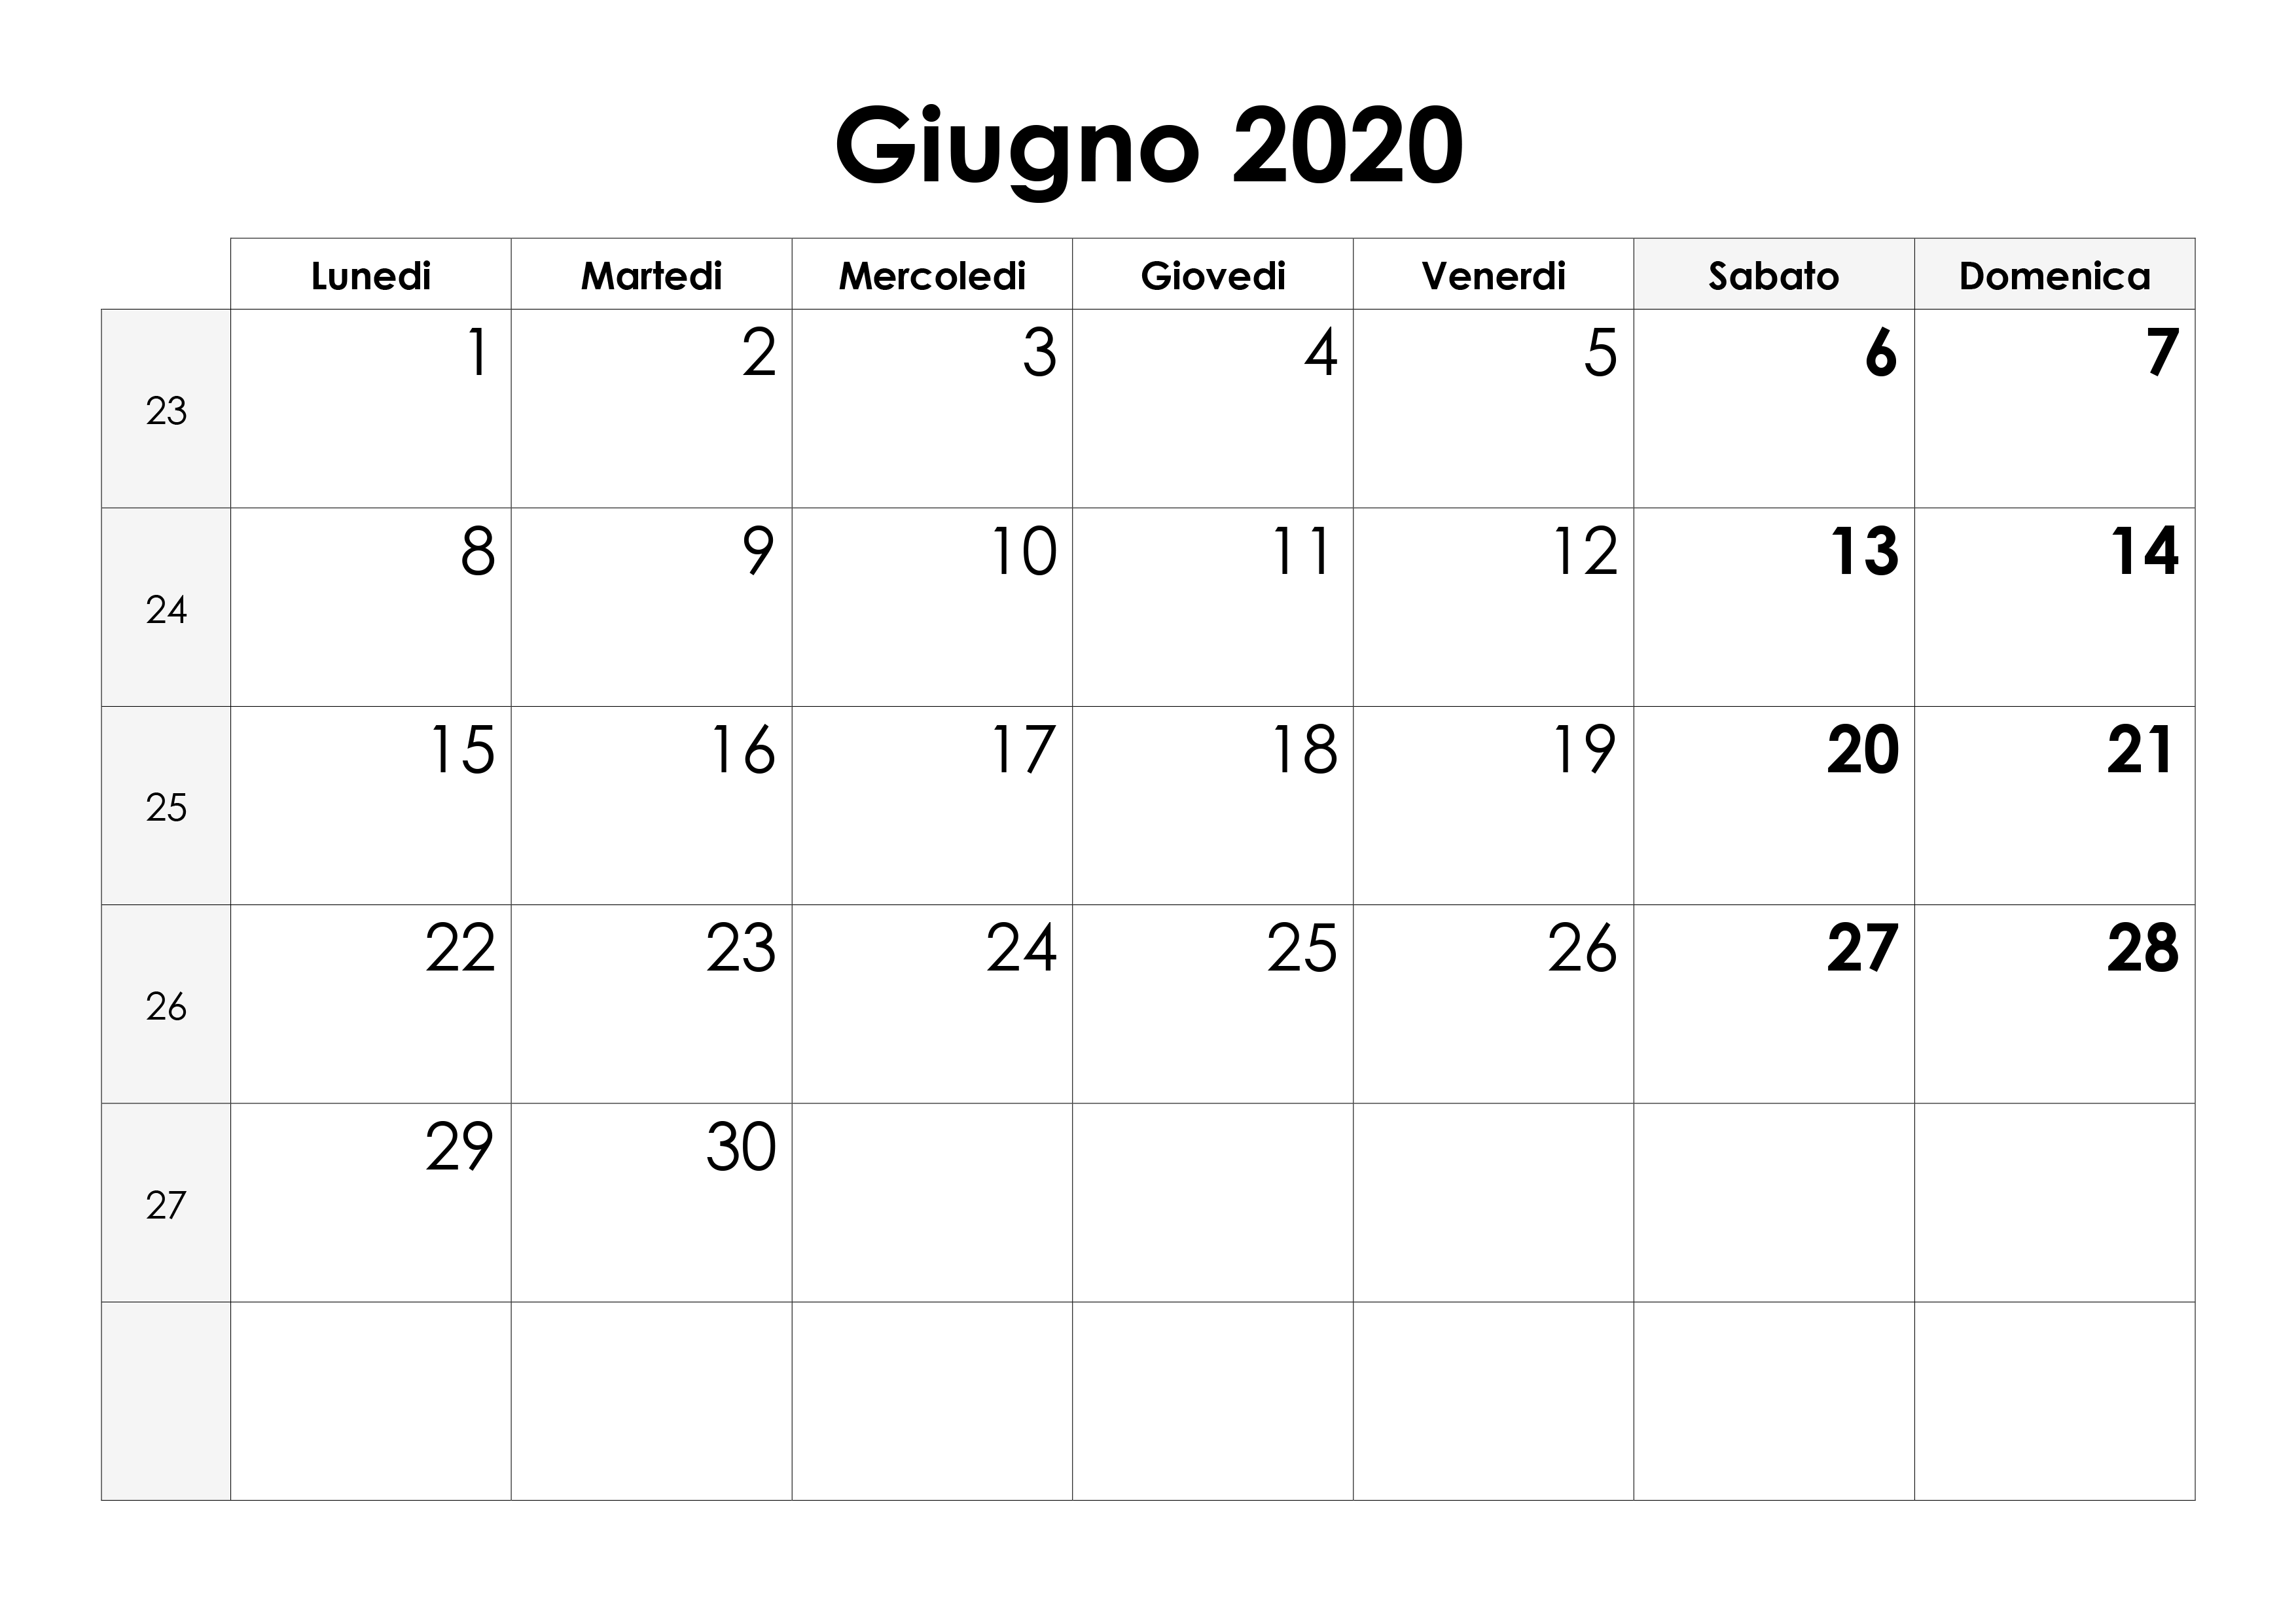 Calendario Maggio Giugno 2020.Calendario Giugno 2020 Calendario Su